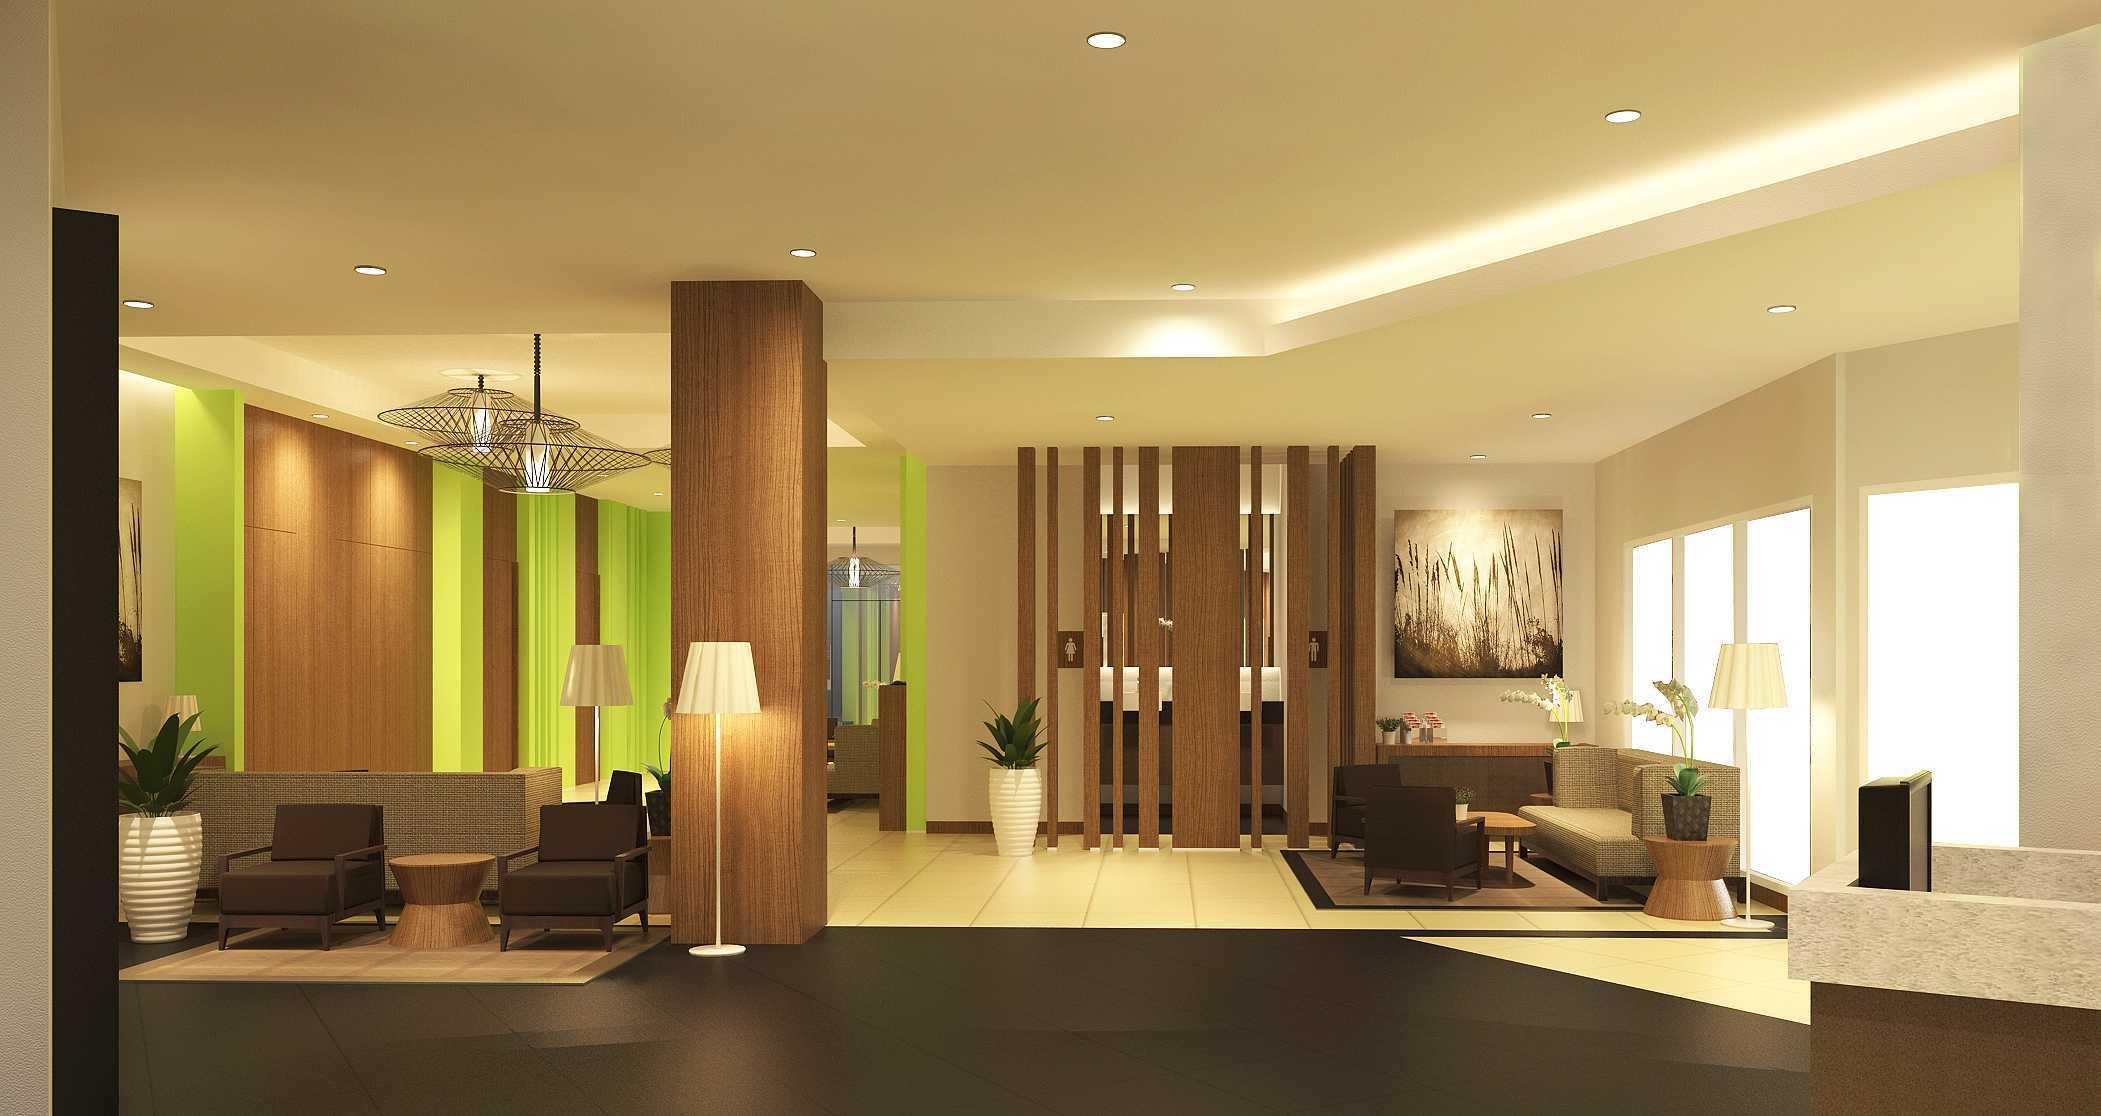 Pt. Modula Hotel Greenotel Cilegon, Kota Cilegon, Banten, Indonesia Cilegon, Kota Cilegon, Banten, Indonesia Interior   38214